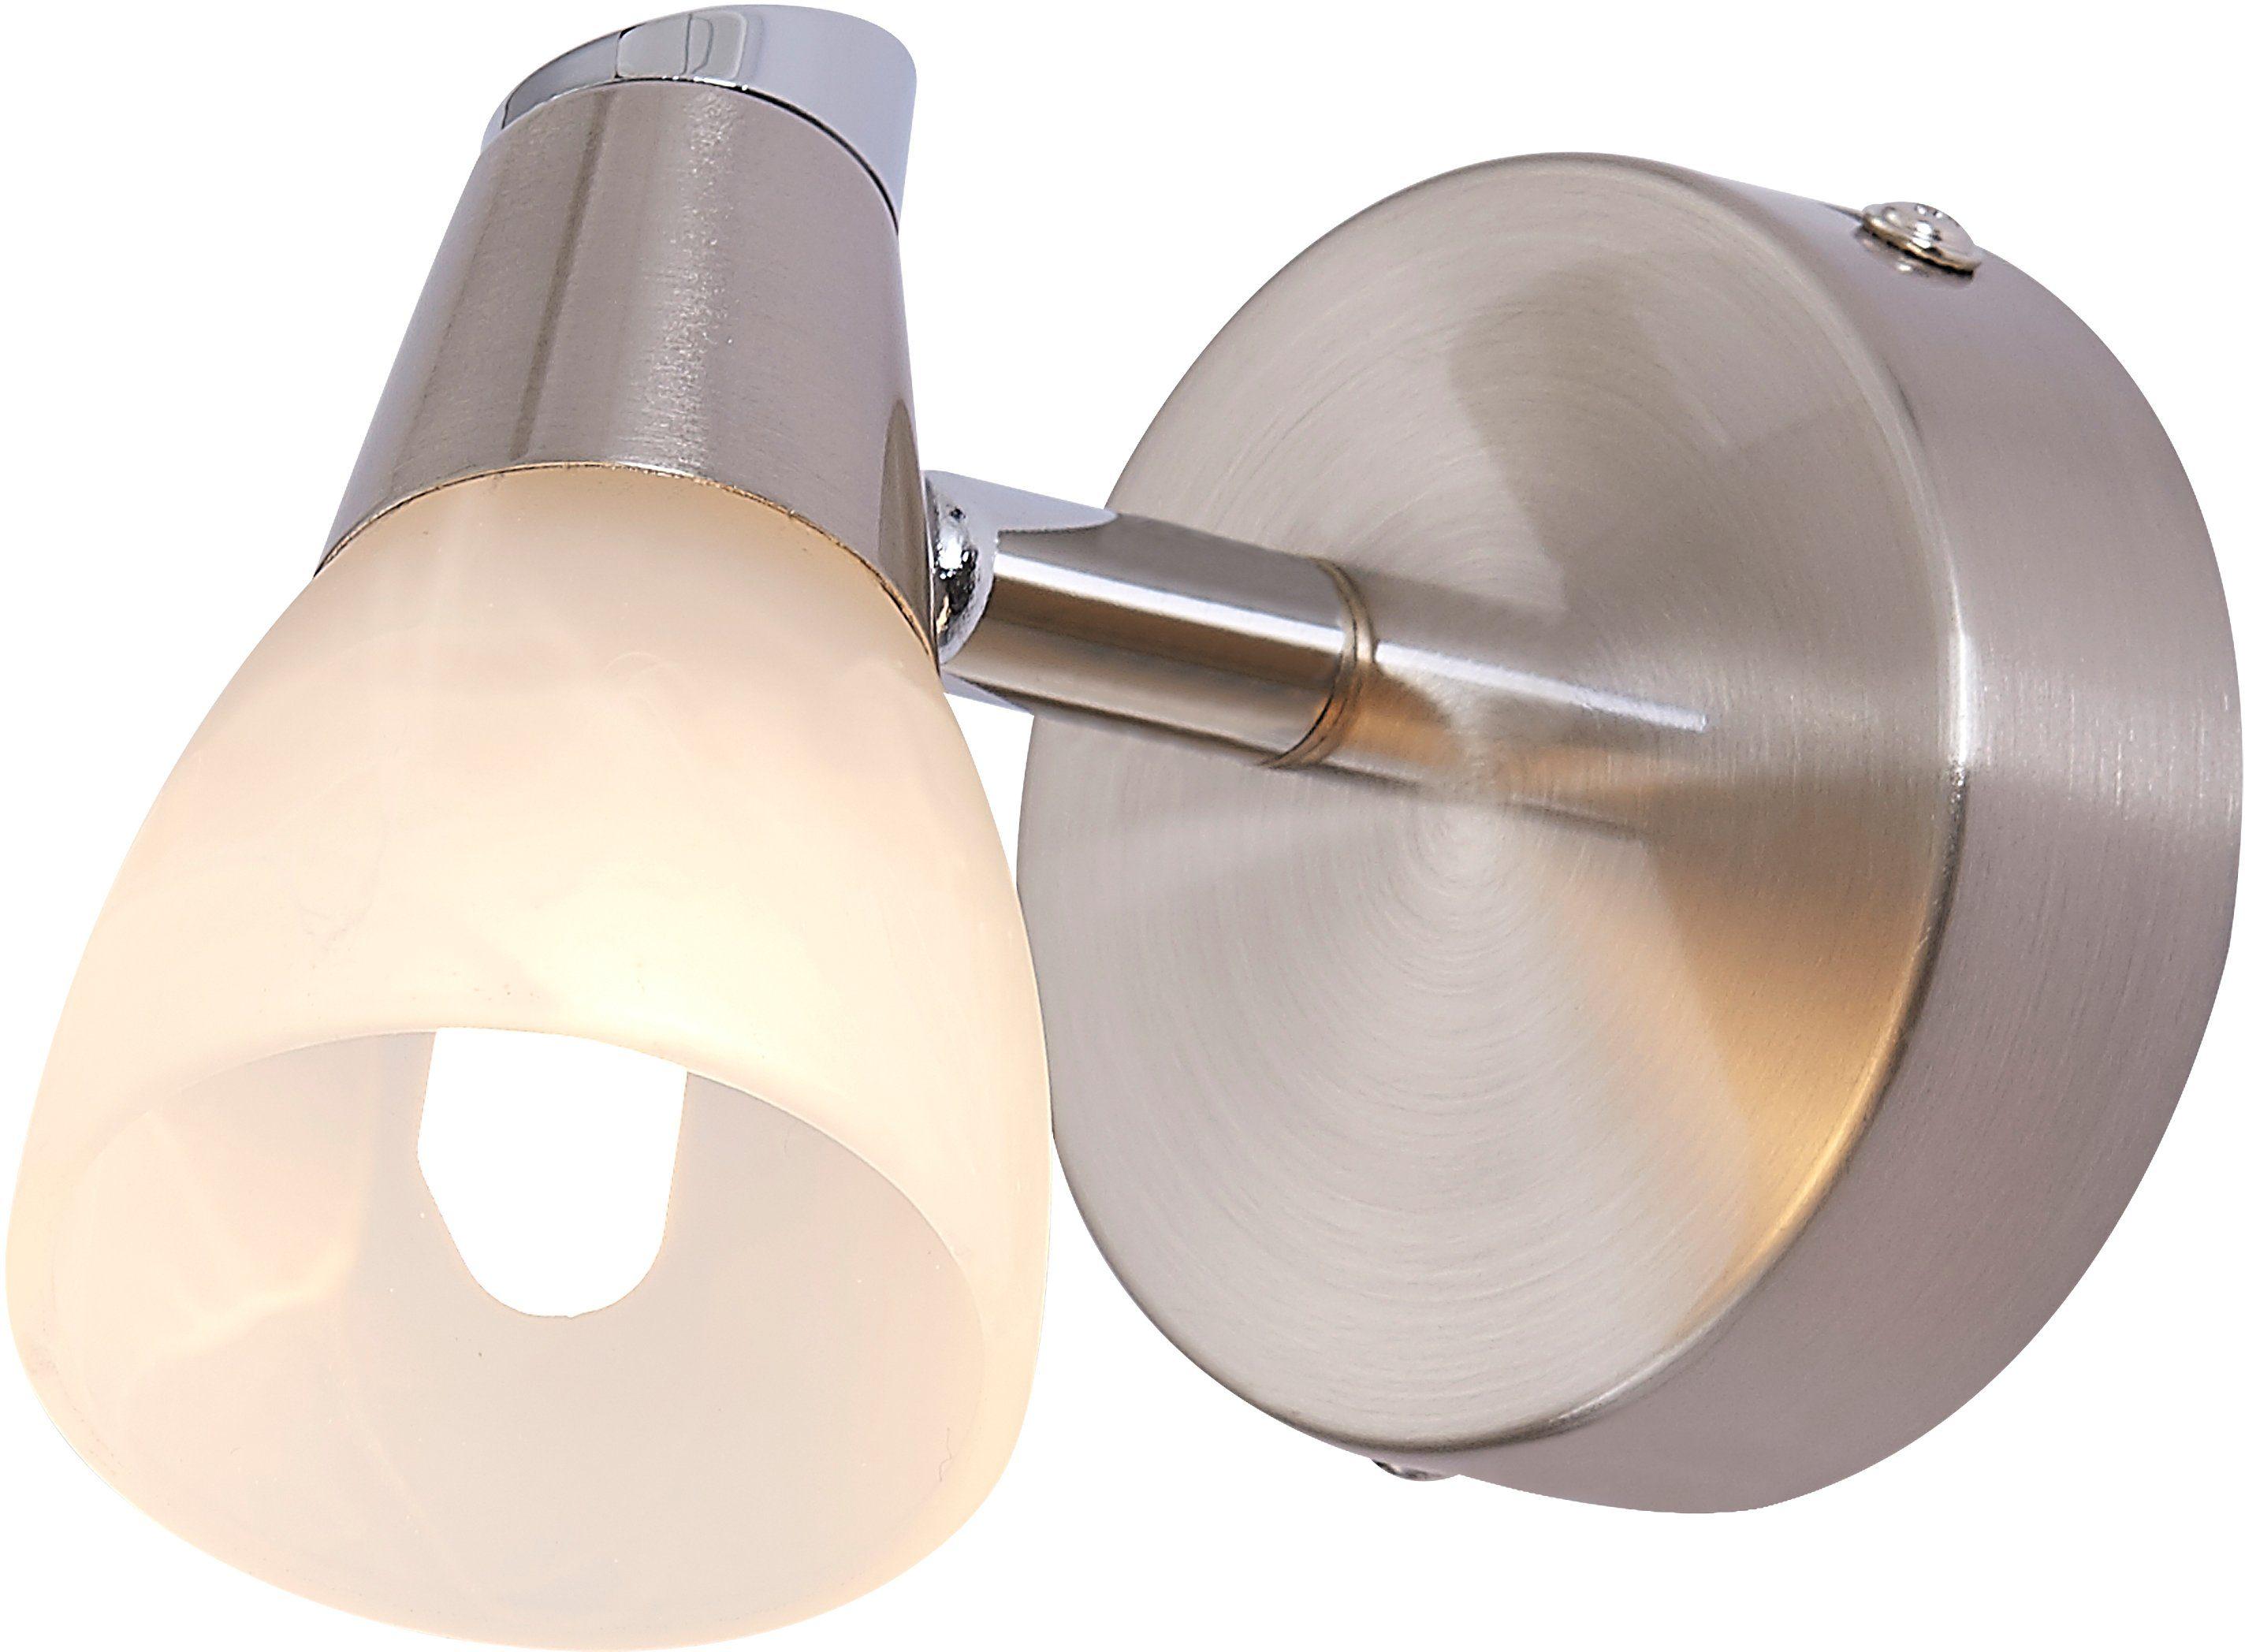 Nino Leuchten LED Wandleuchte »LAIKA«, 1-flammig